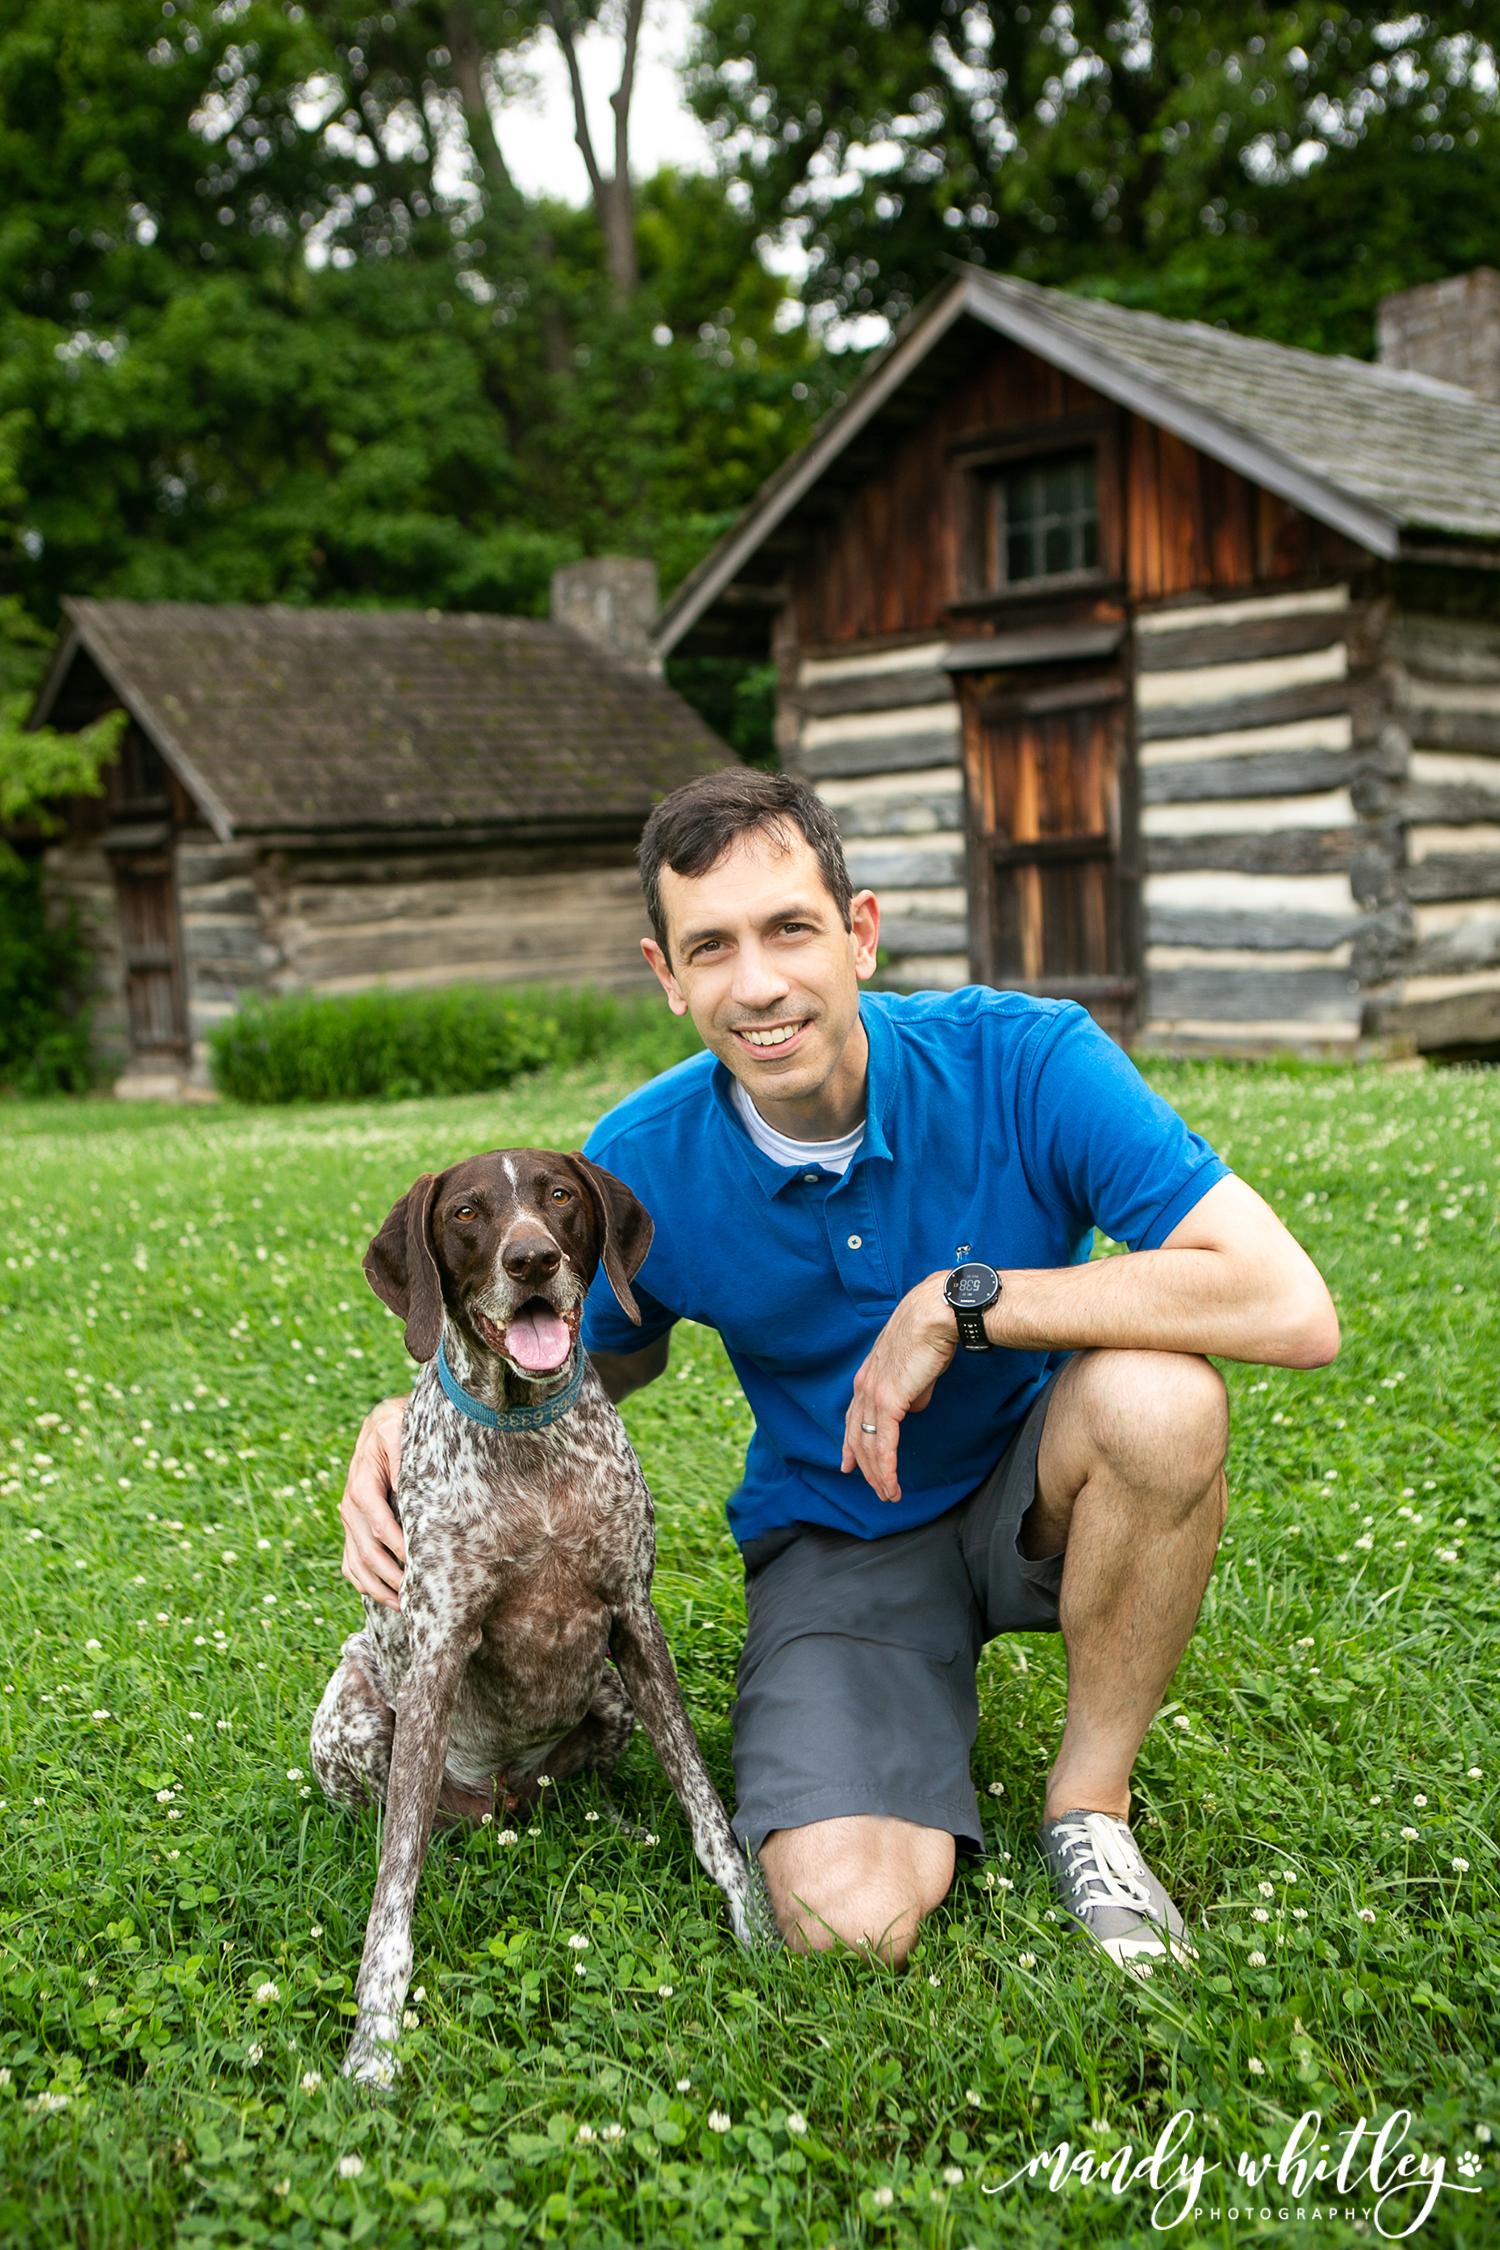 Pet Photographer in Nashville